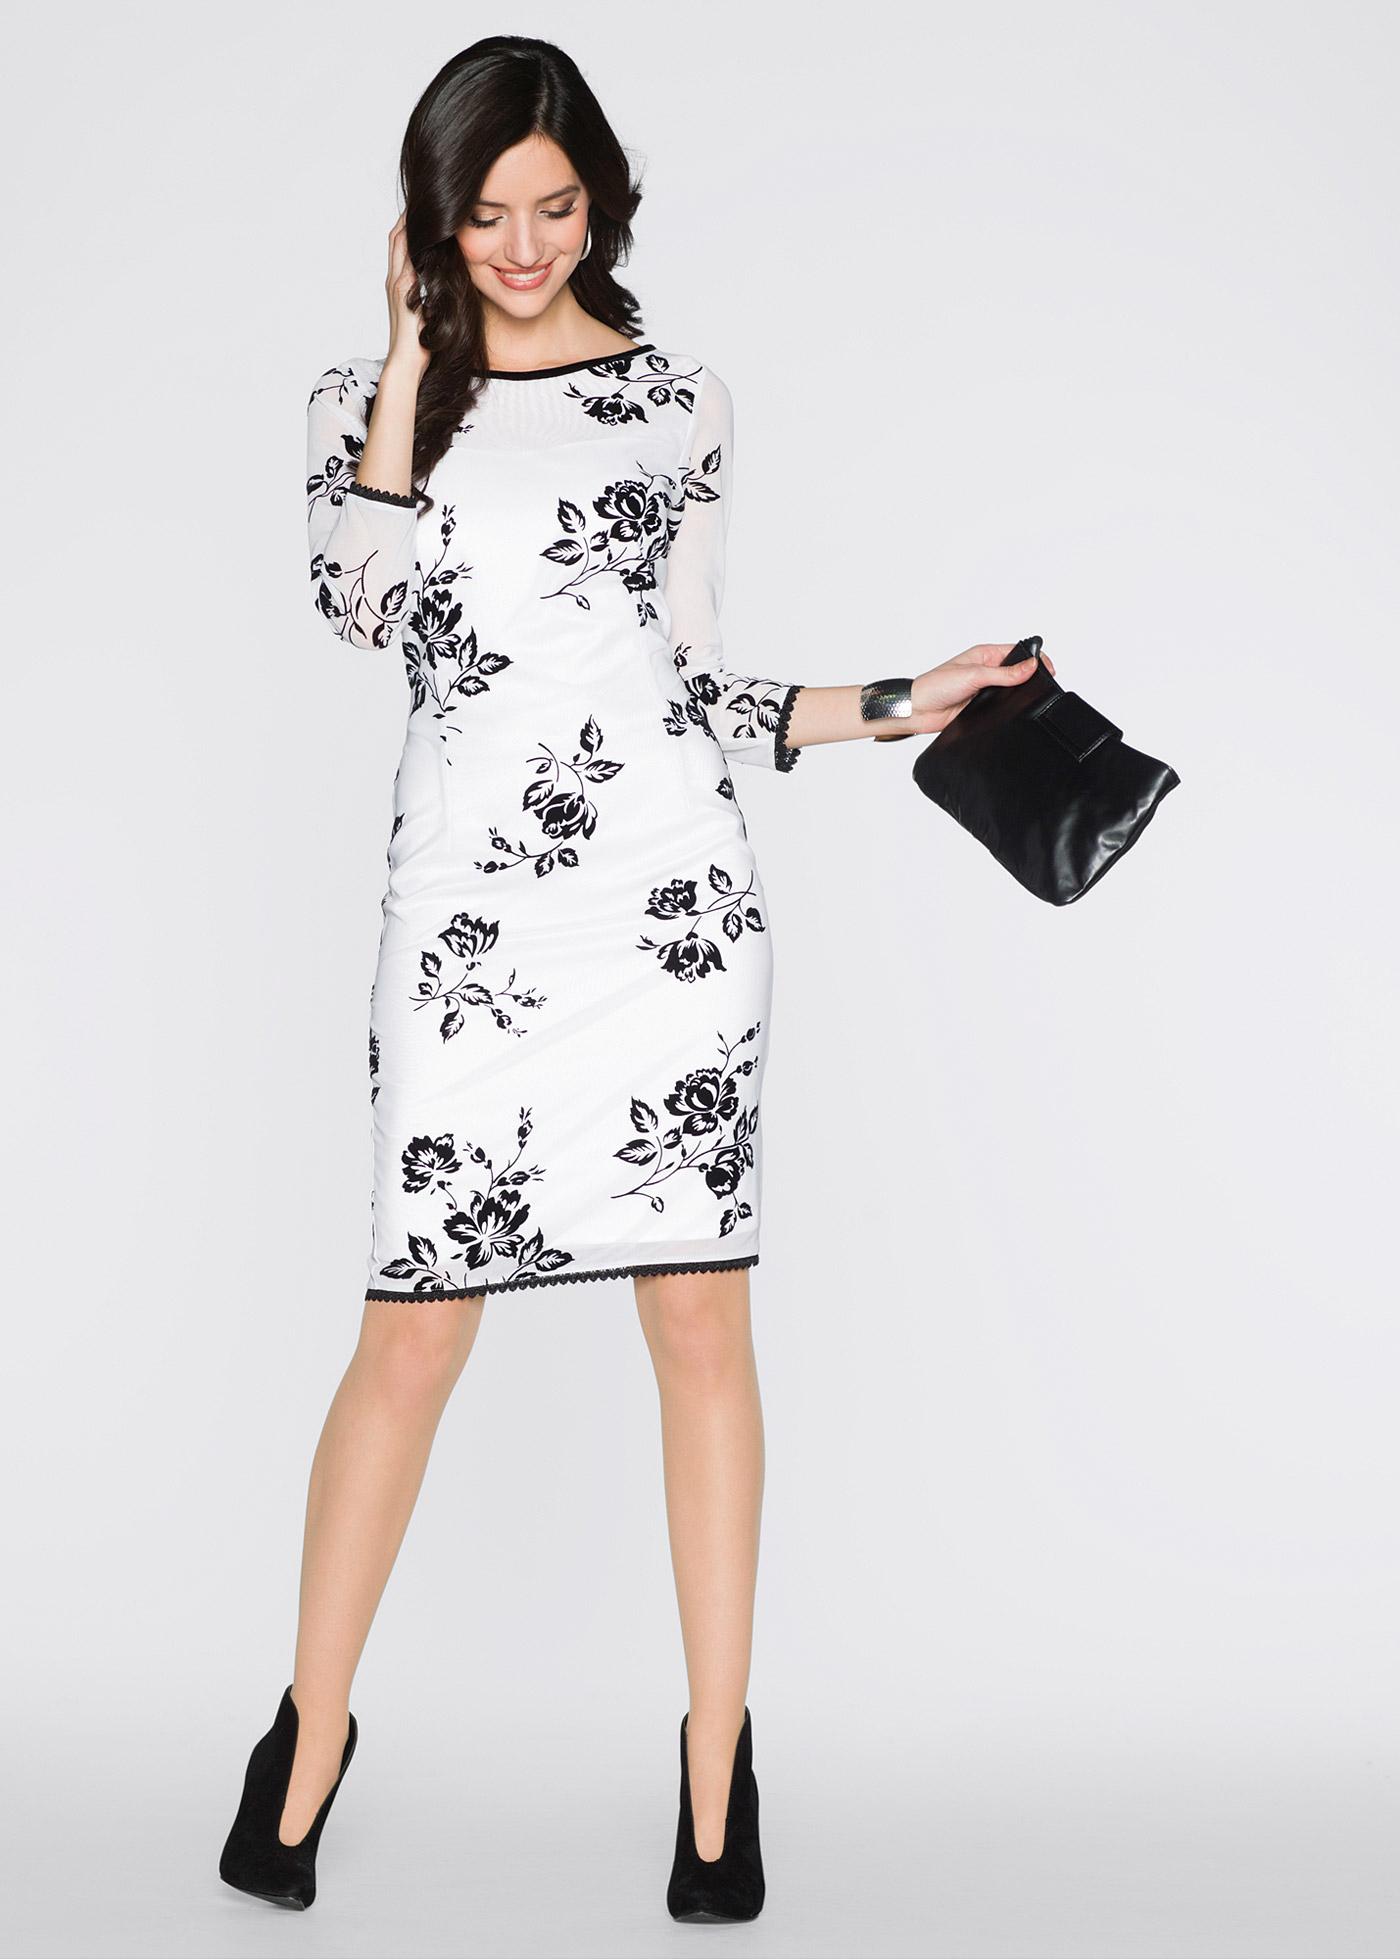 105d040b1d7 Платье белый черный с узором - BODYFLIRT заказать онлайн - bonprix.kz ·  zoom in